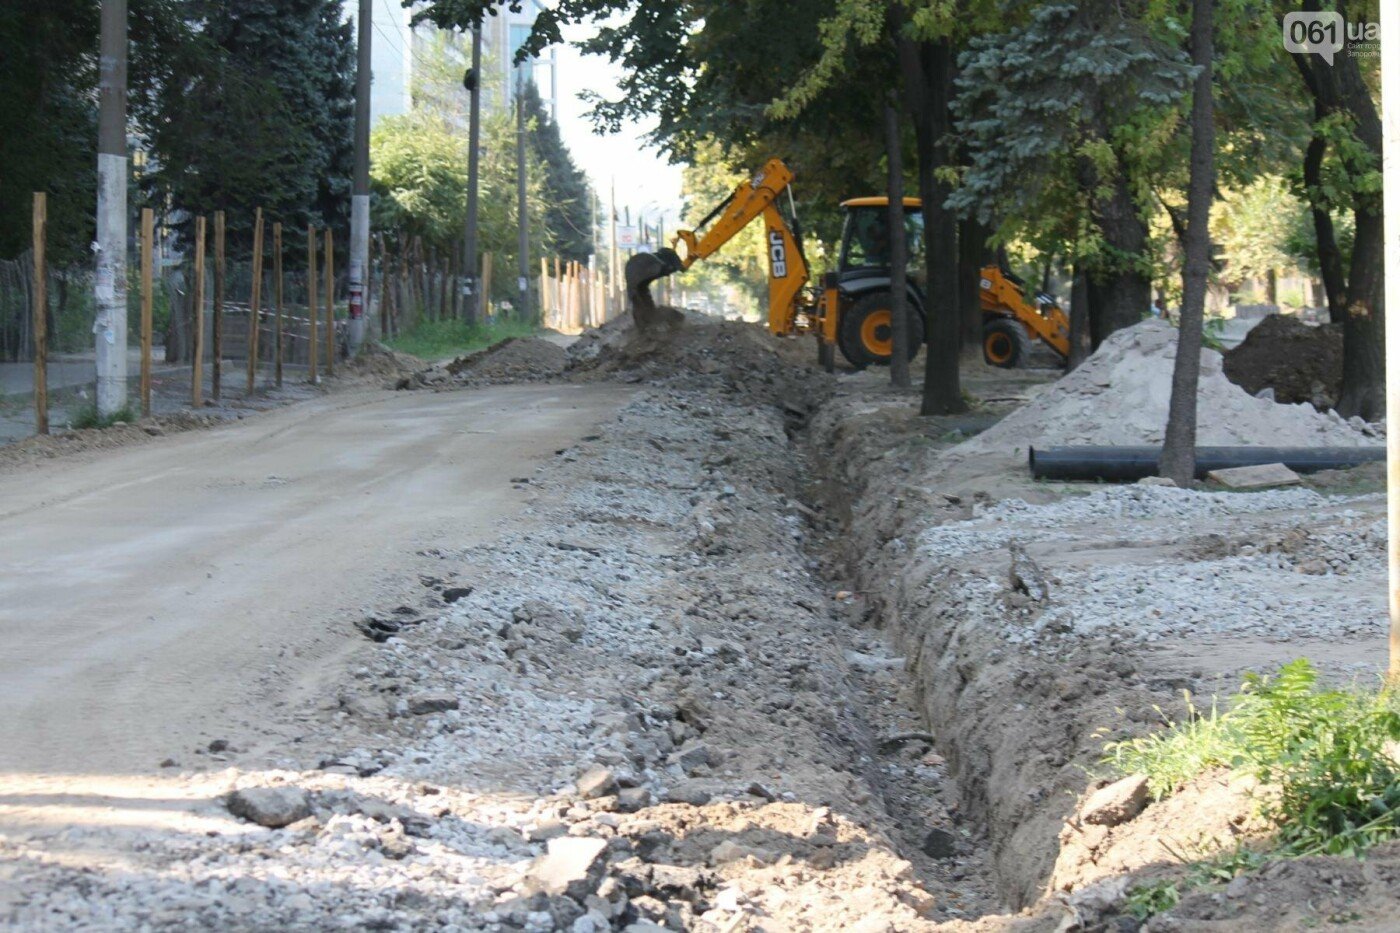 В Запорожье 900 метров дороги на Маяковского отремонтируют за 37 миллионов гривен, фото-1